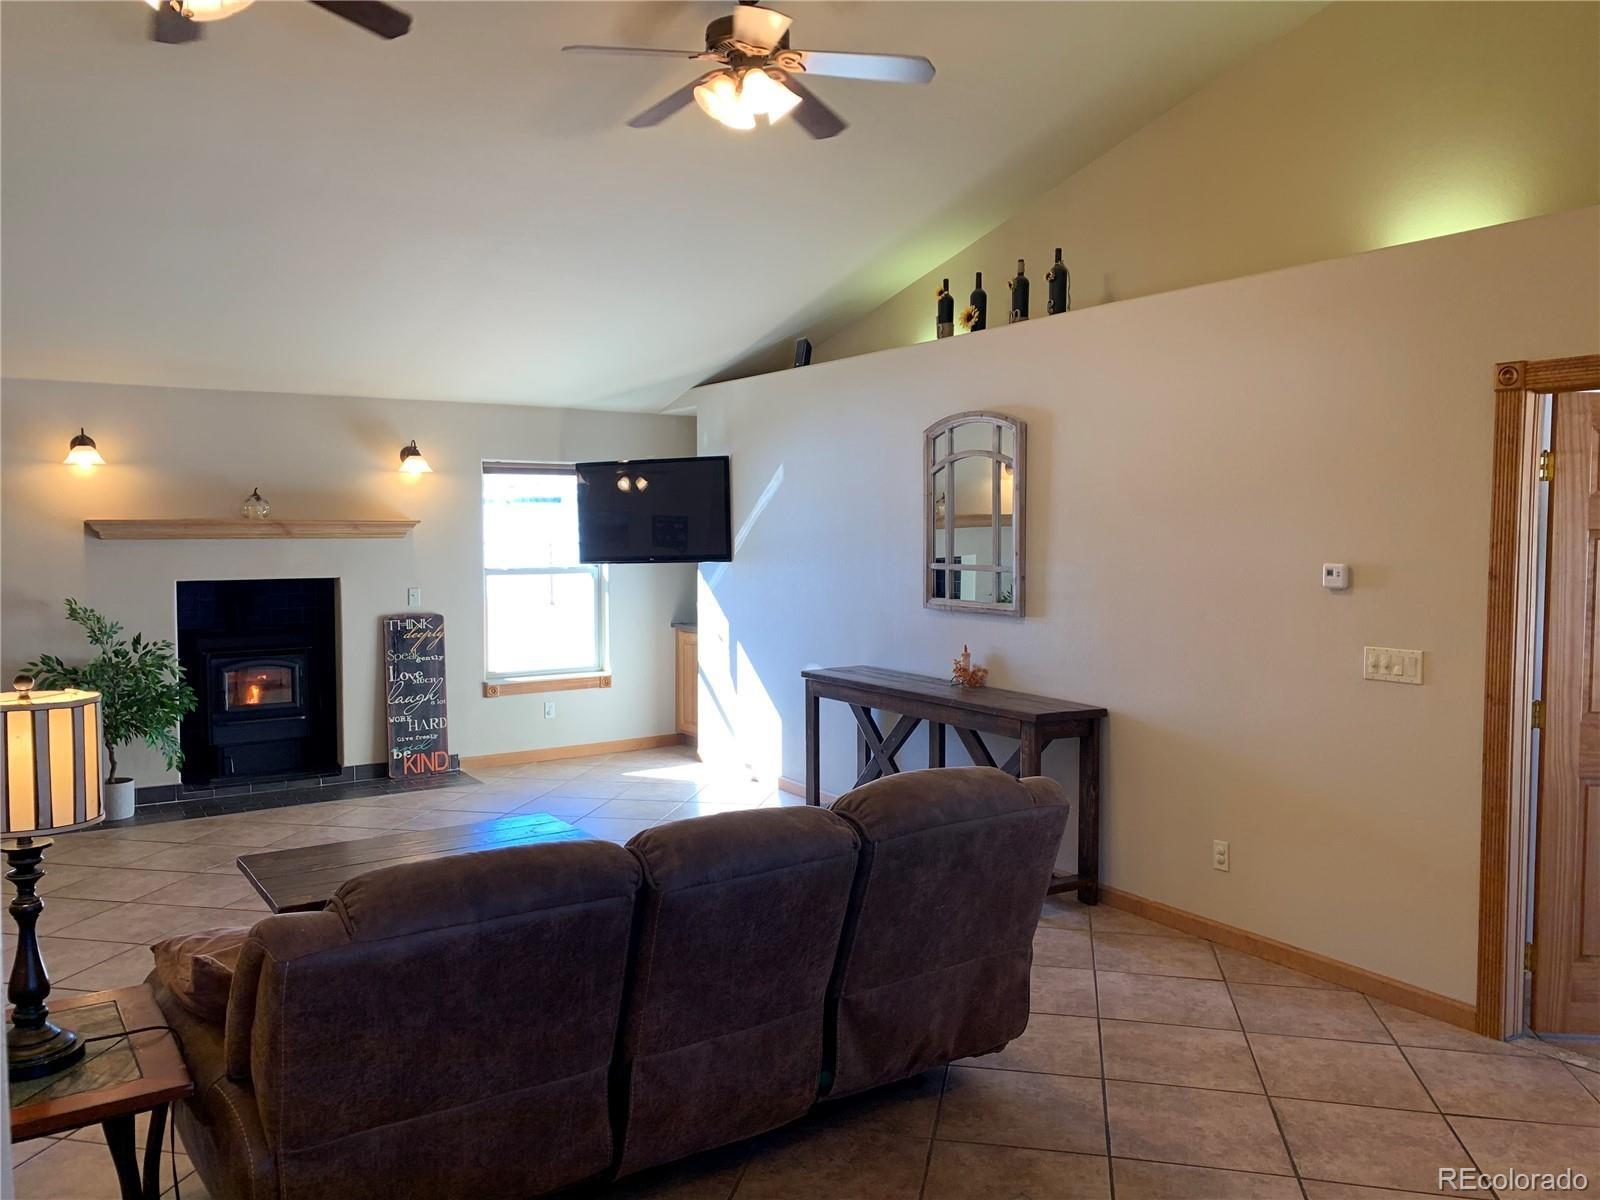 MLS# 7097007 - 5 - 27635 Rancho Sawatch , Buena Vista, CO 81211